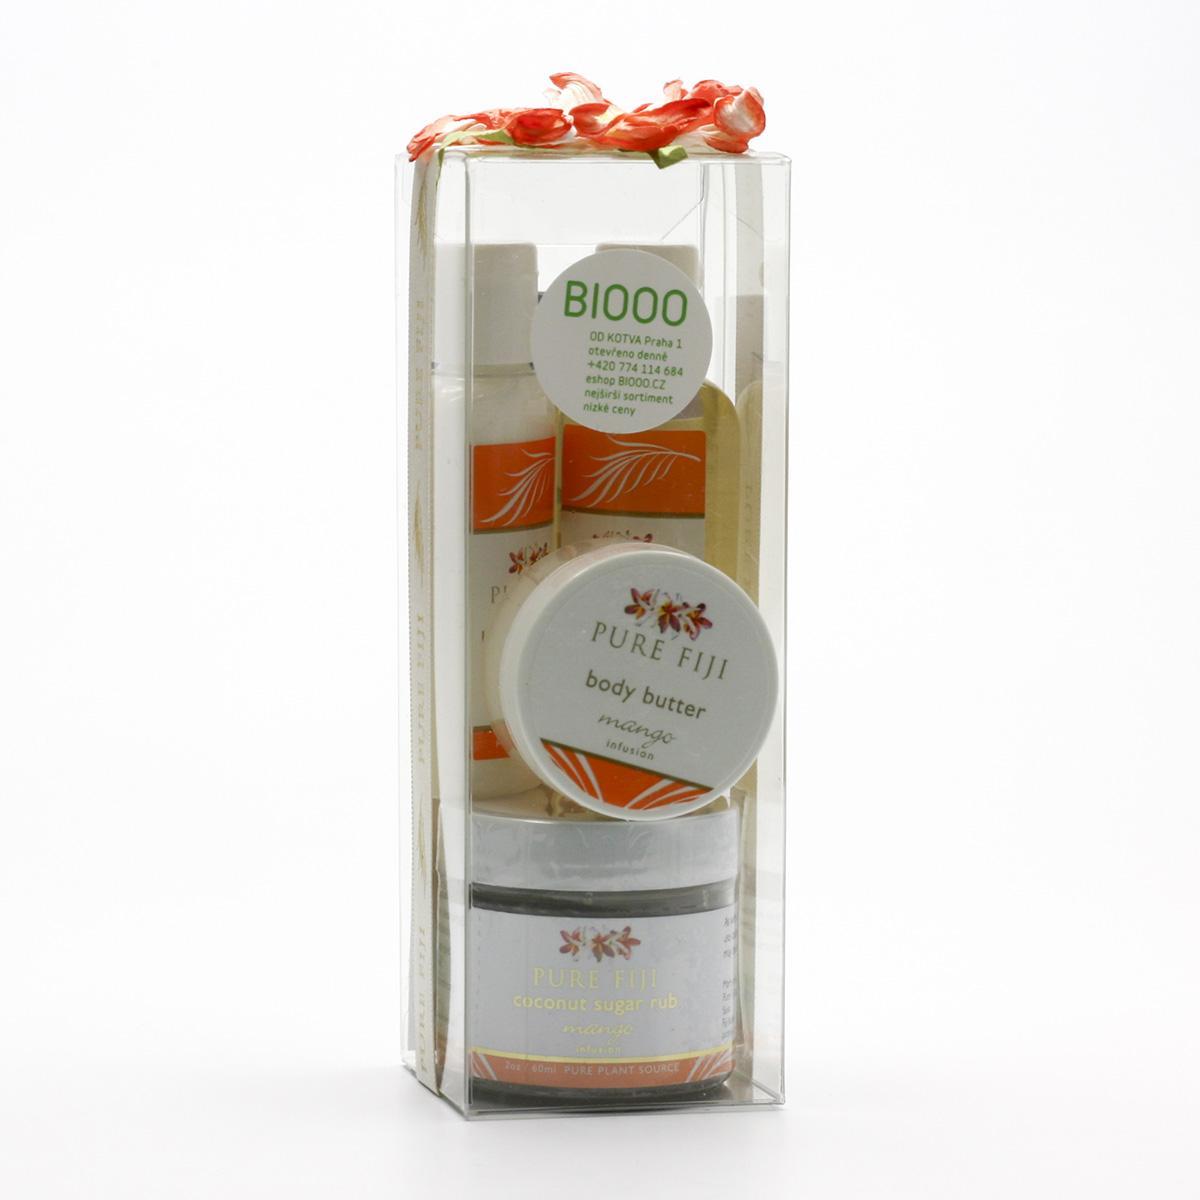 Pure Fiji Dárková sada kokosových produktů, mango 4 ks